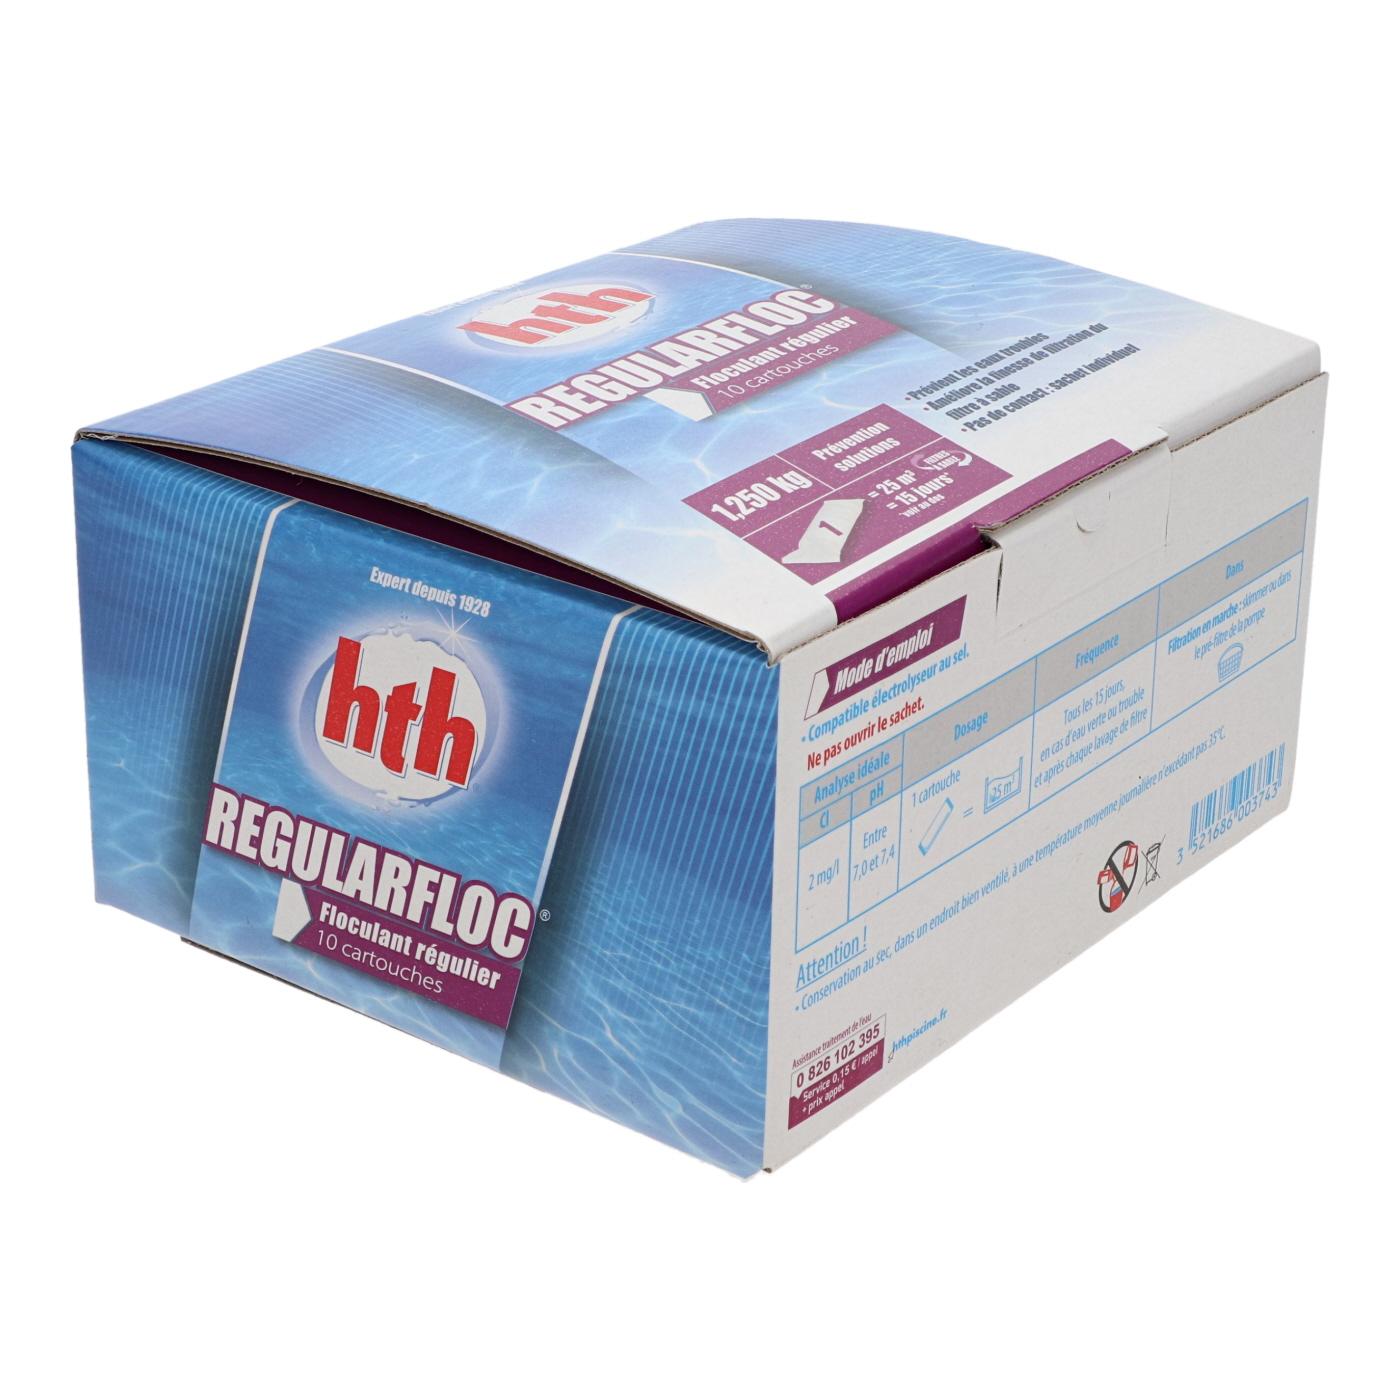 RegularFloc HTH Spa